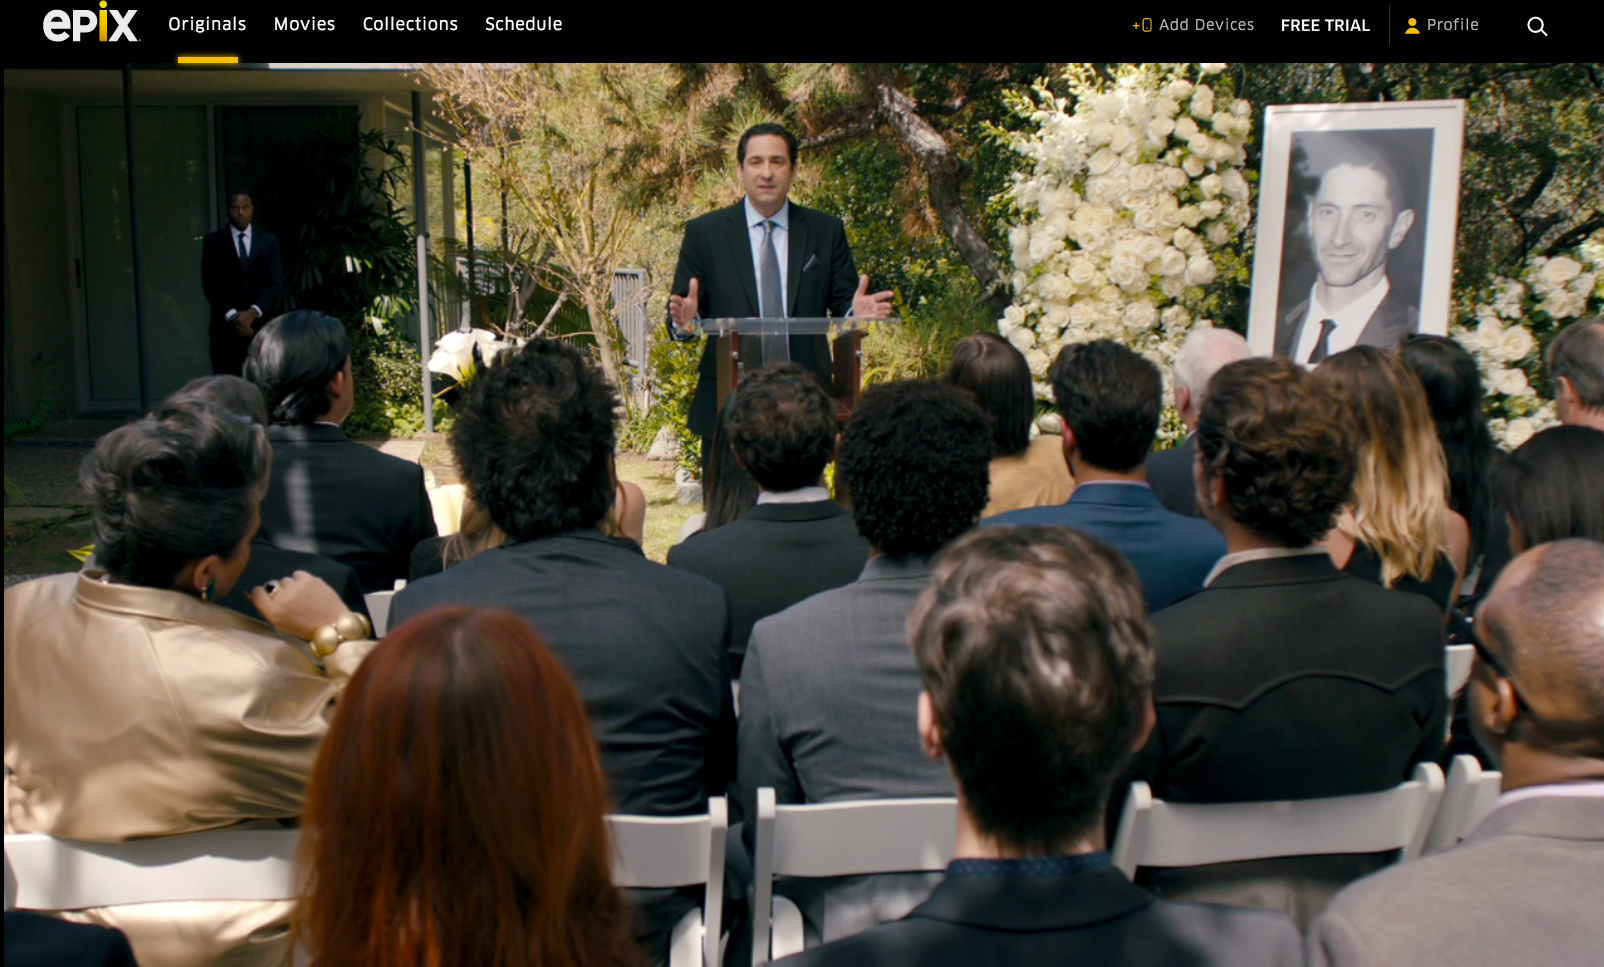 David Babich appearing in Get Shorty, season 2, Episode 4.